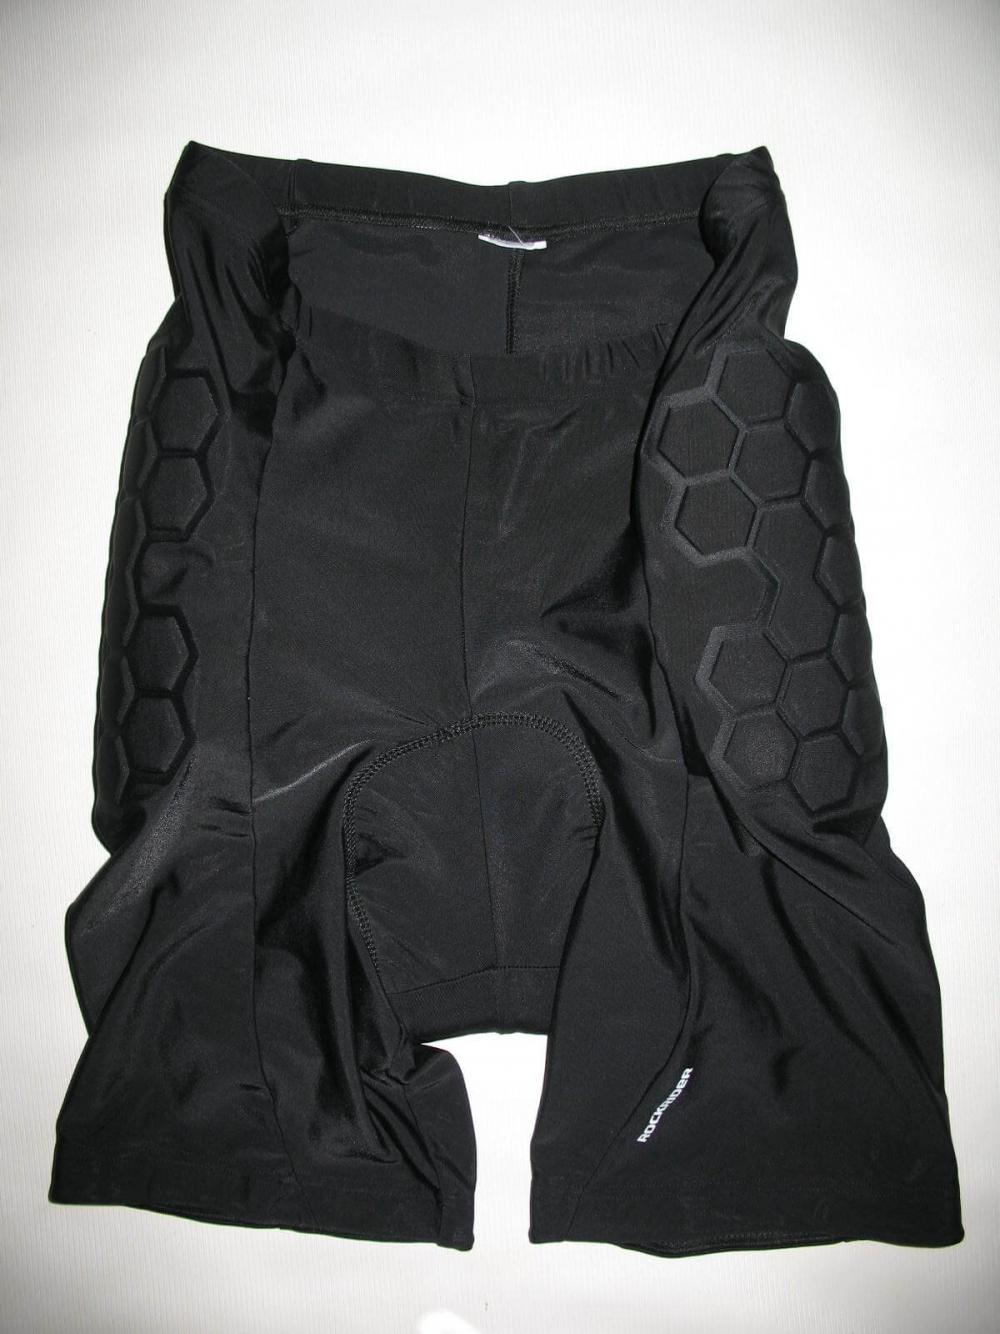 Велошорты ROCKRAIDER bike shorts (размер L) - 1